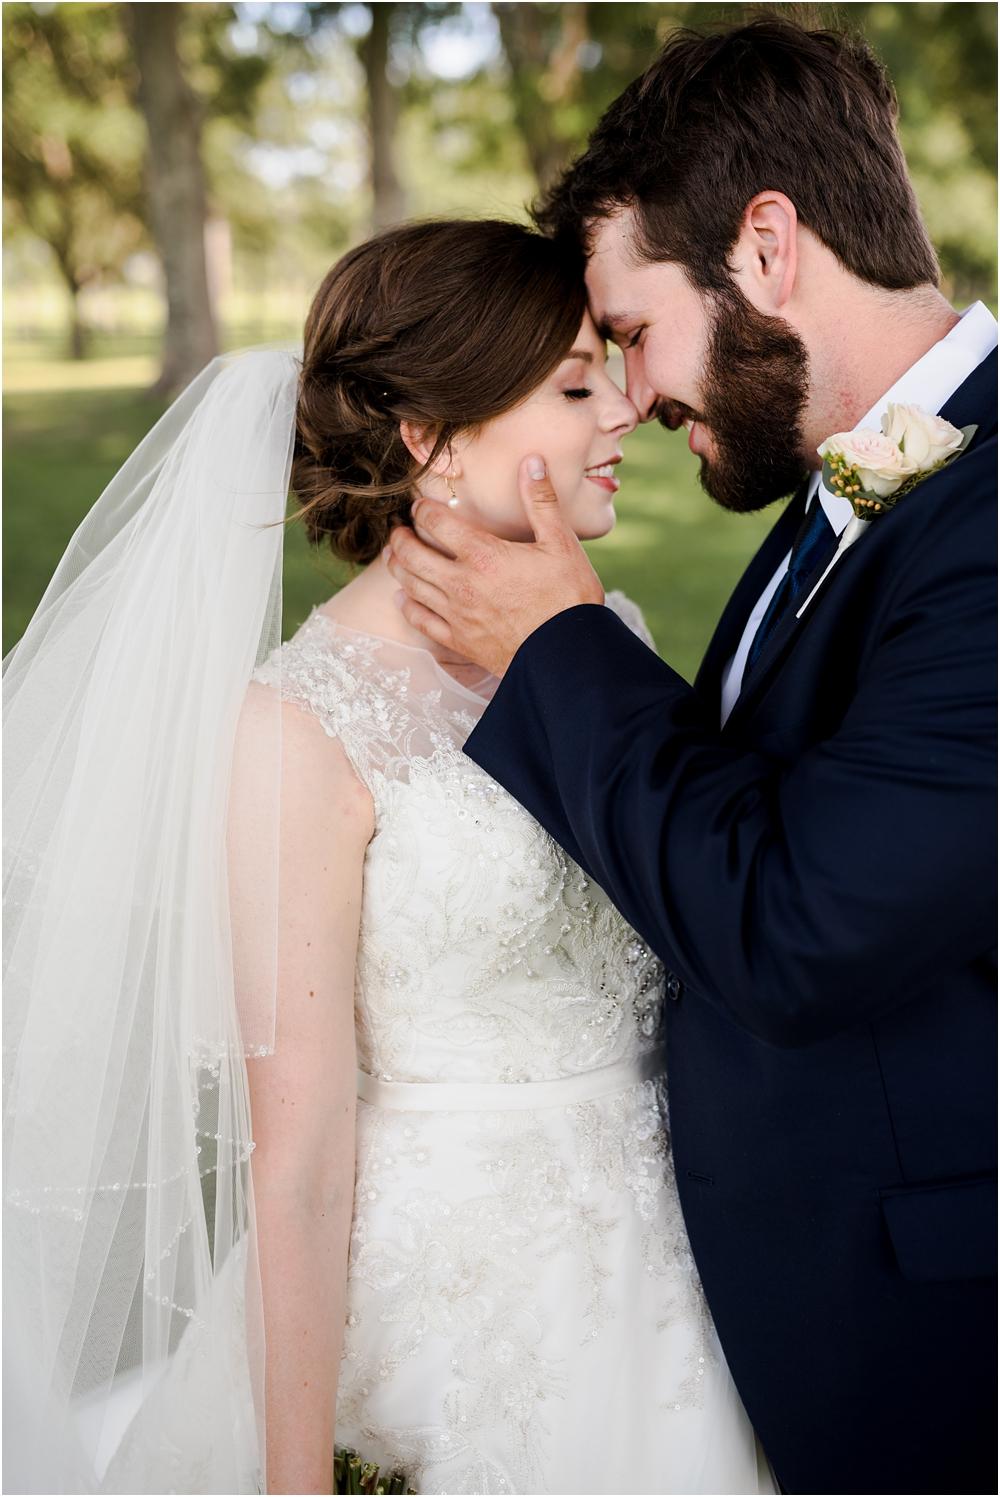 marianna-florida-wedding-photographer-kiersten-grant-76.jpg